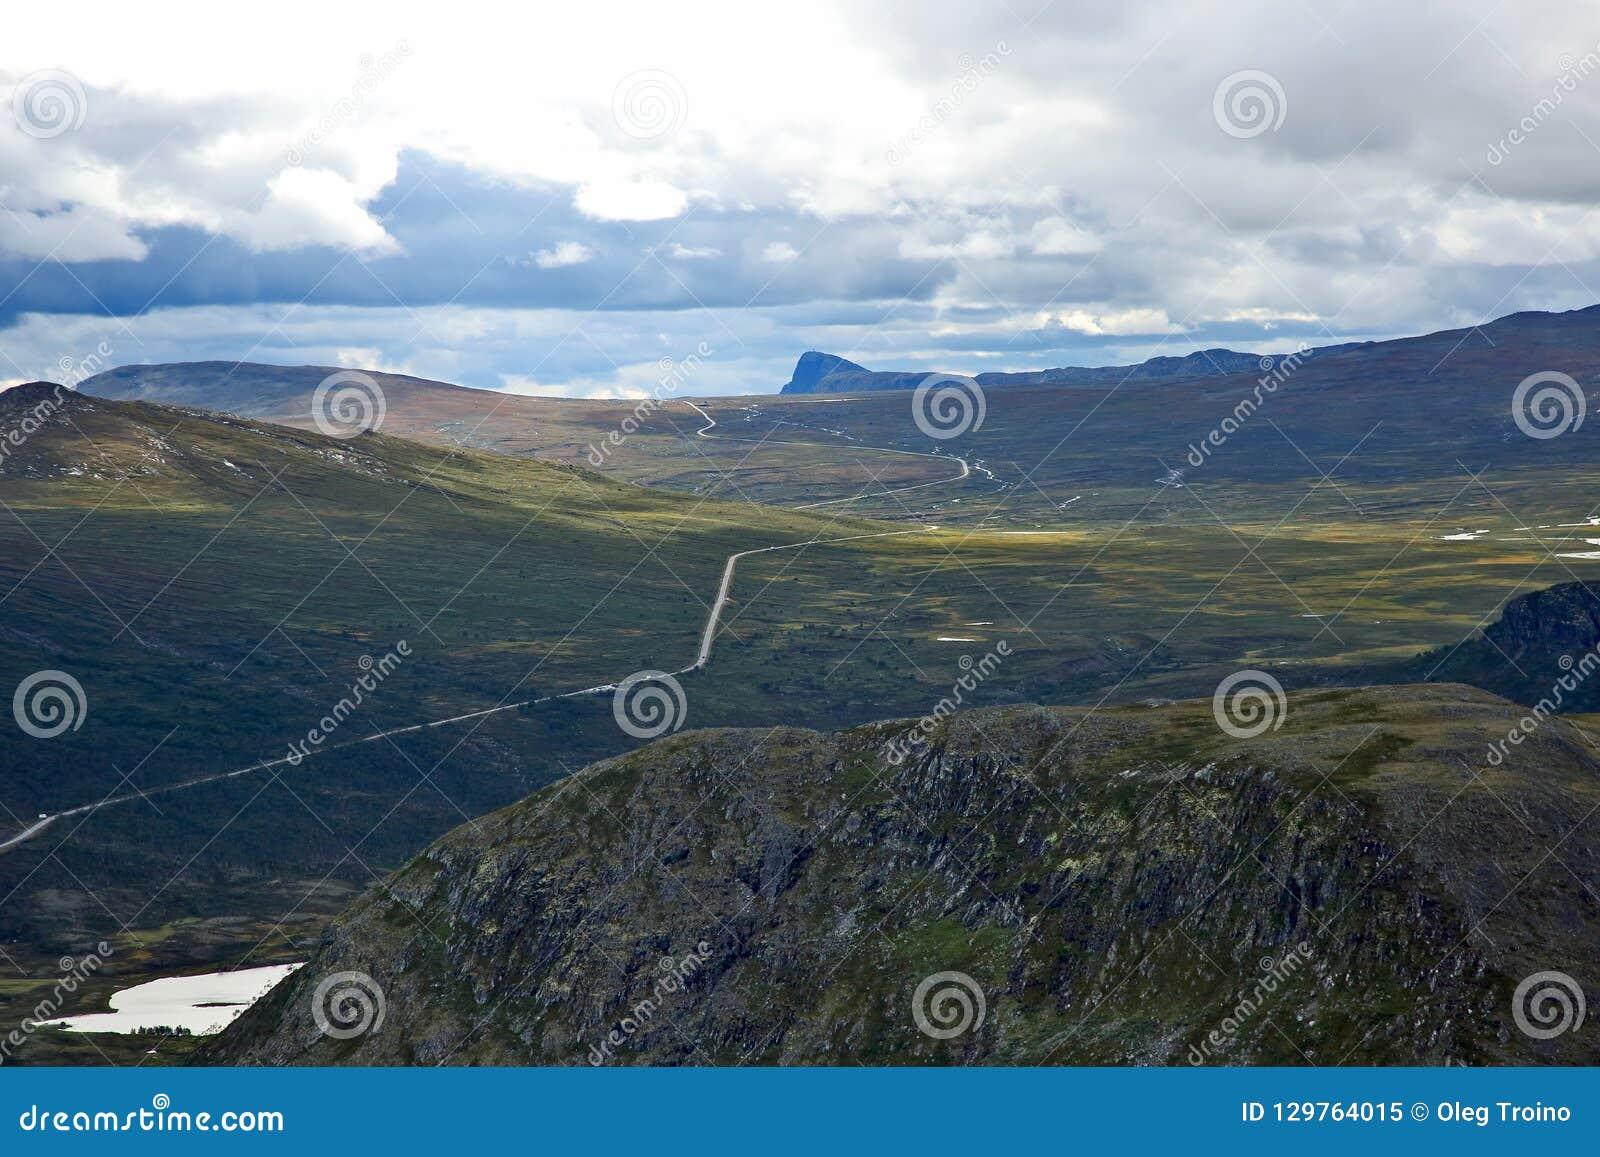 Terreno montanhoso em Noruega Parque nacional de Jotunheimen